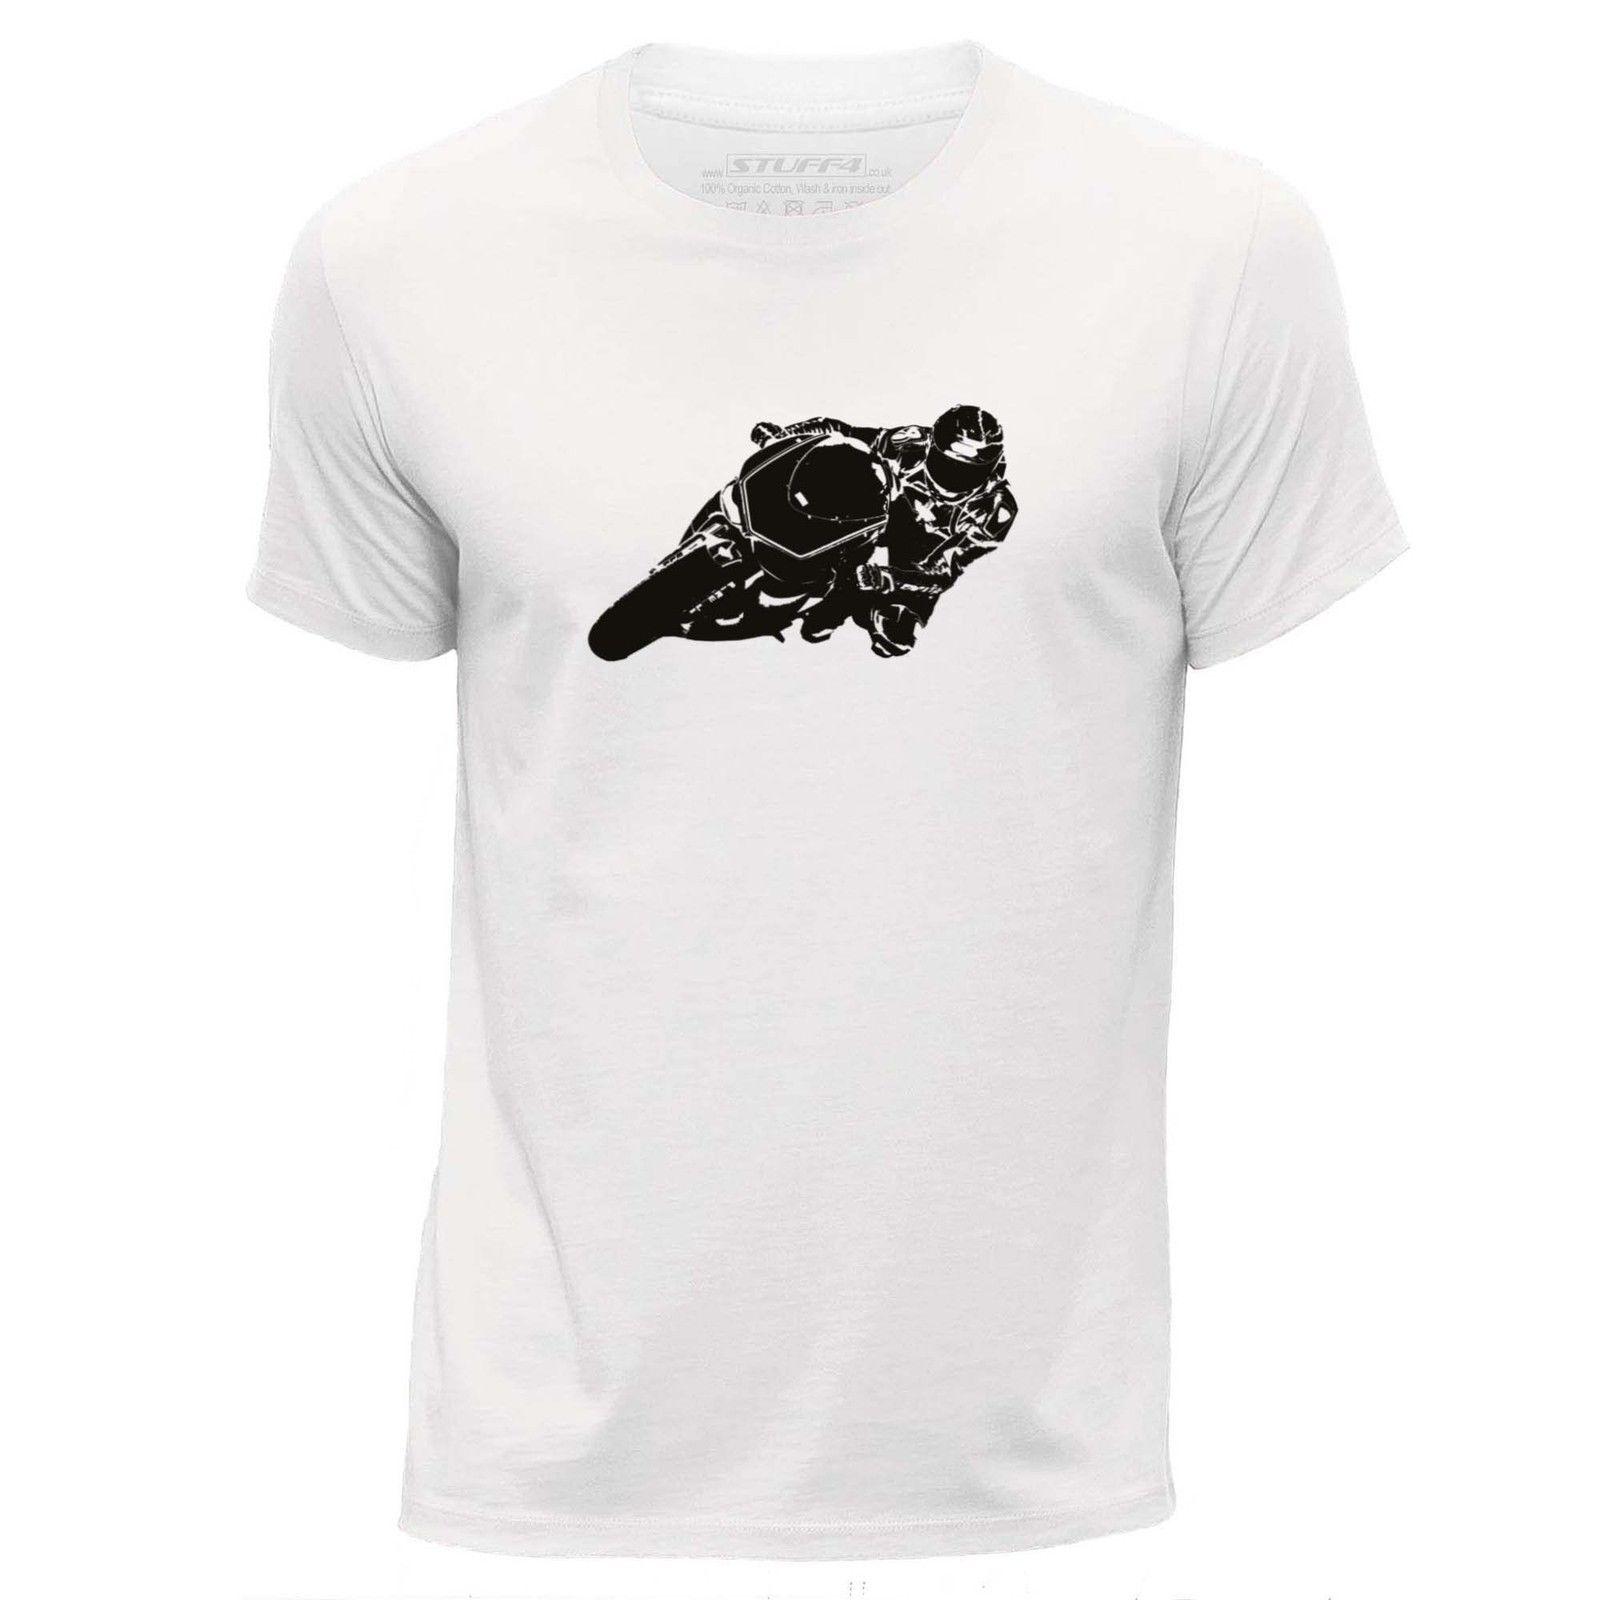 Da Stencil Bianca Uomo Art T Shirt Girocollo Stuff4 Acquista n8wNm0